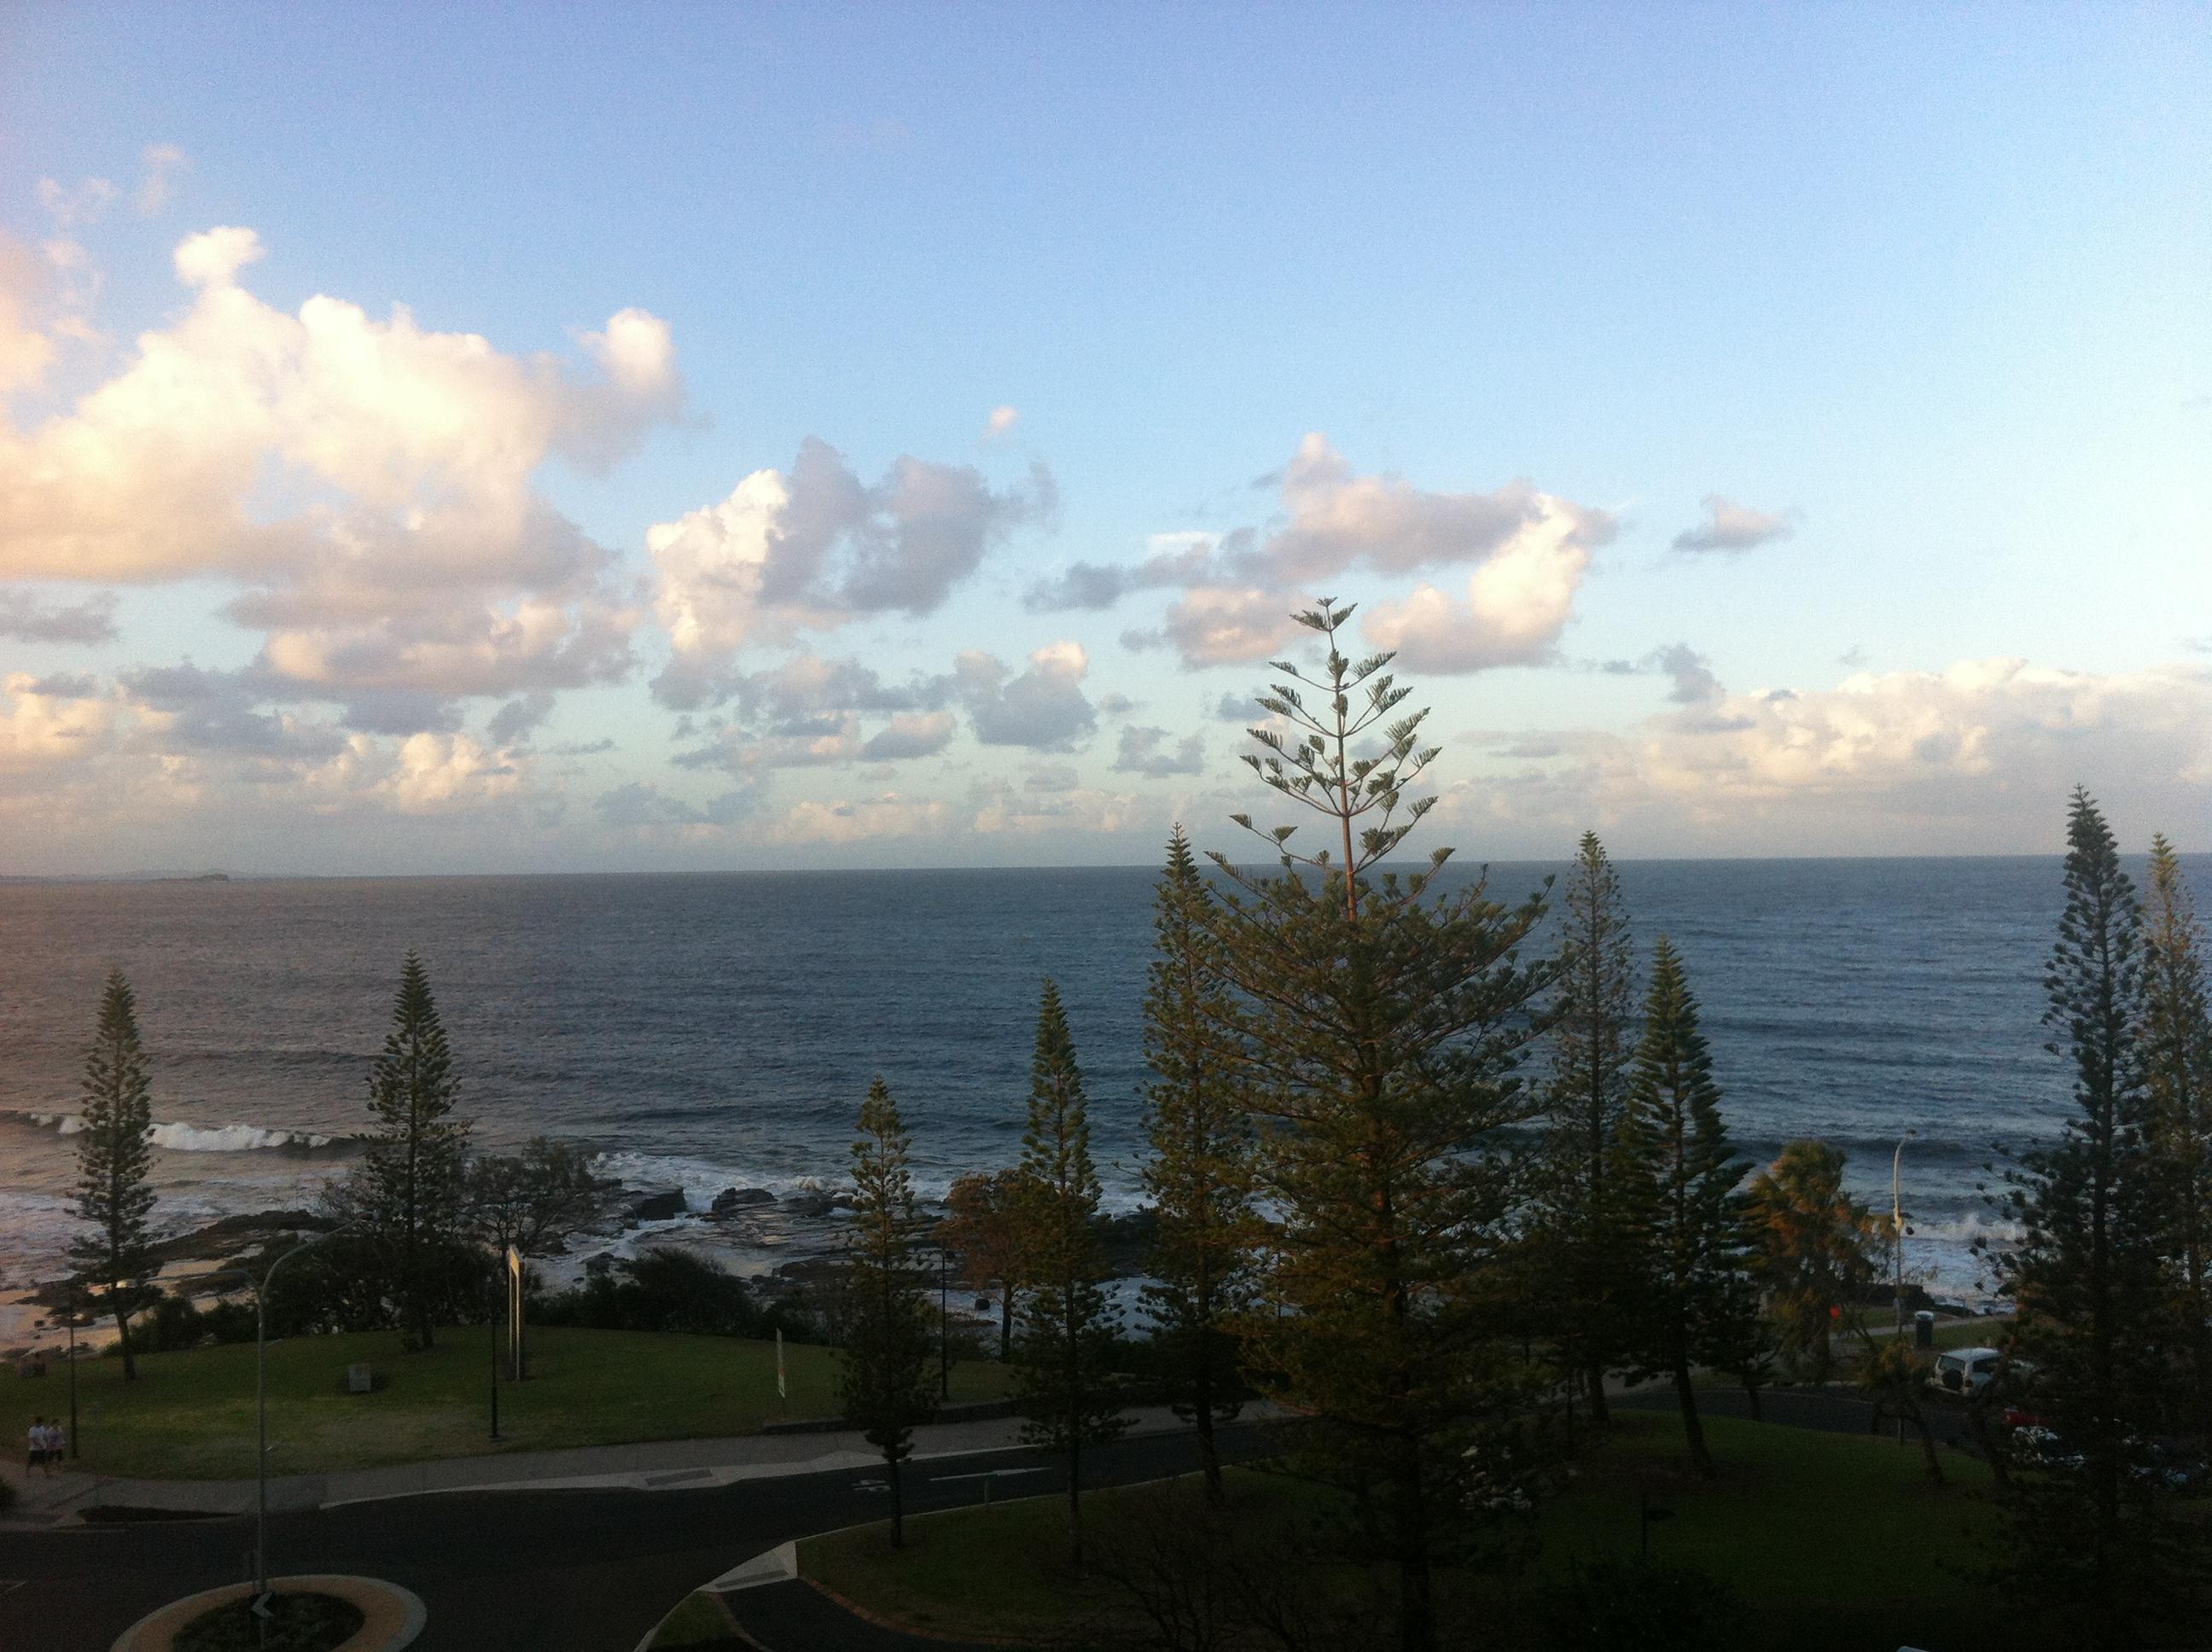 Mooloolaba QLD 2 Days later - All good :)